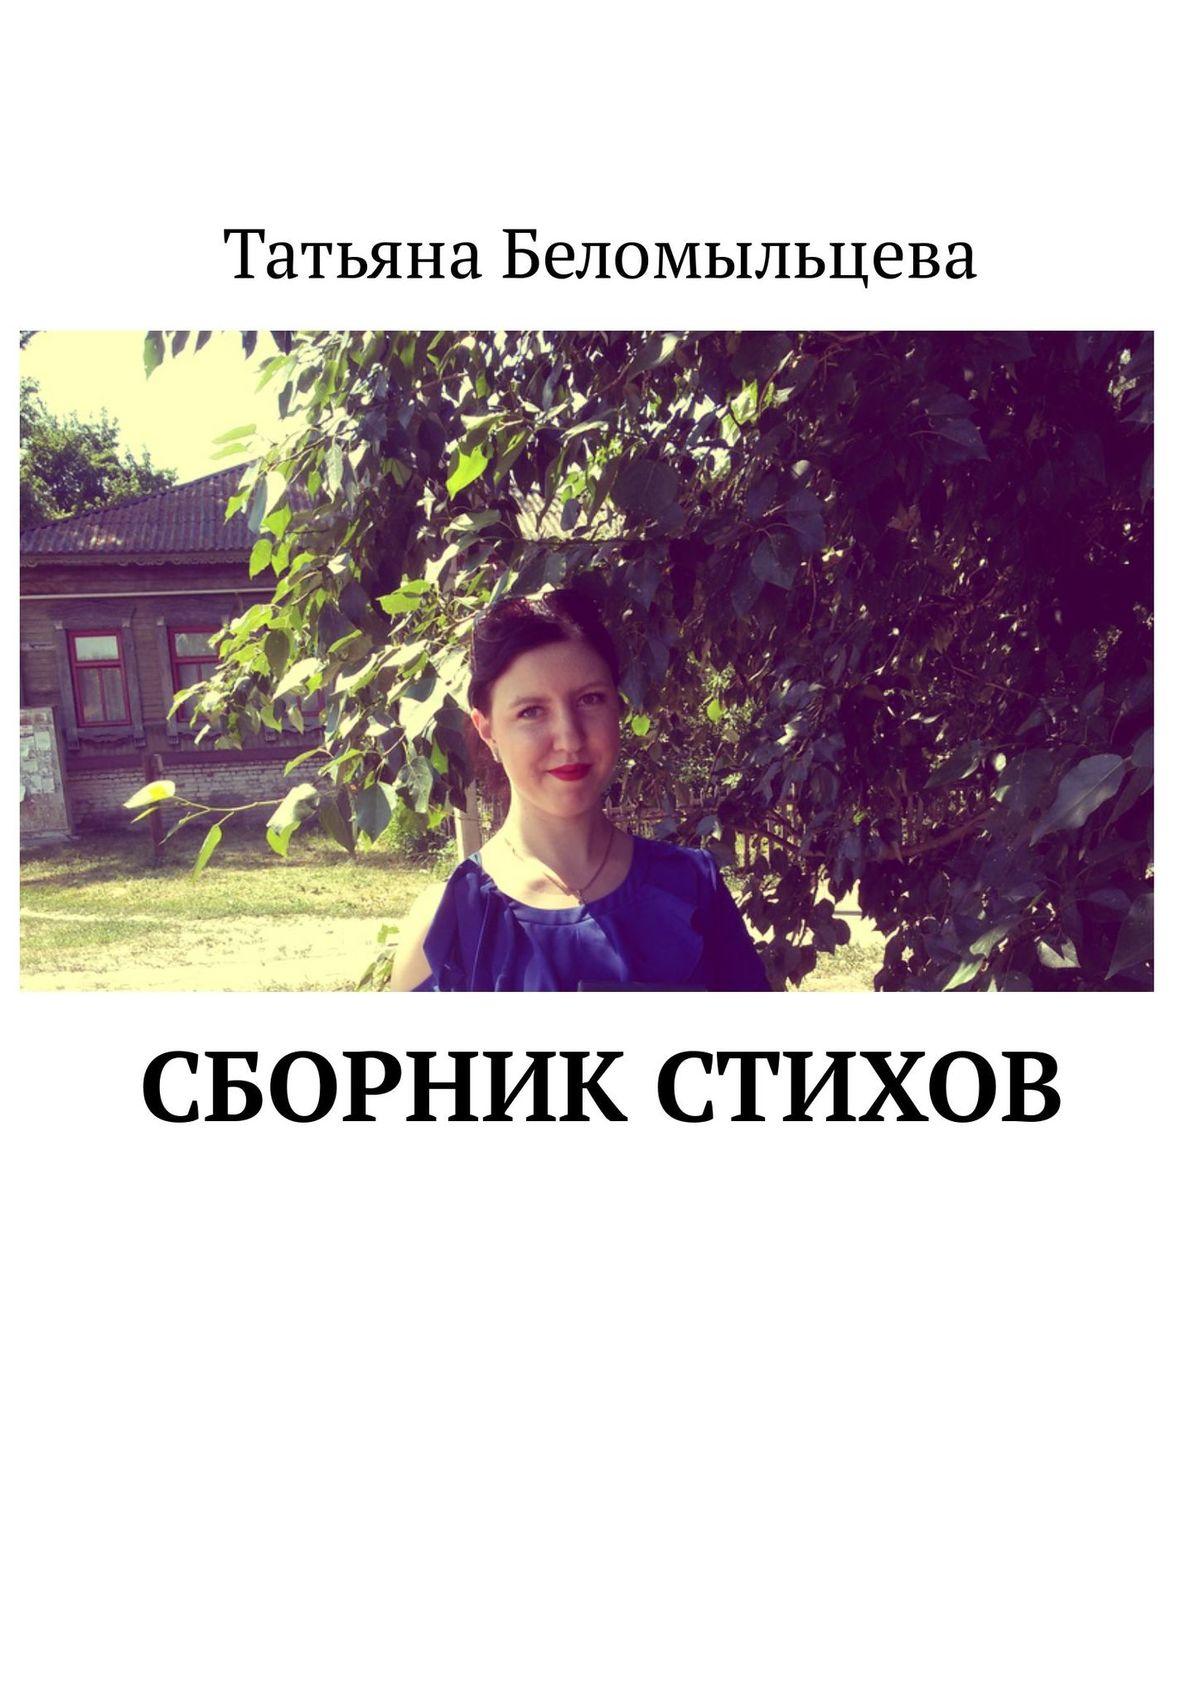 Татьяна Беломыльцева Сборник стихов татьяна булатова счастливо оставаться сборник